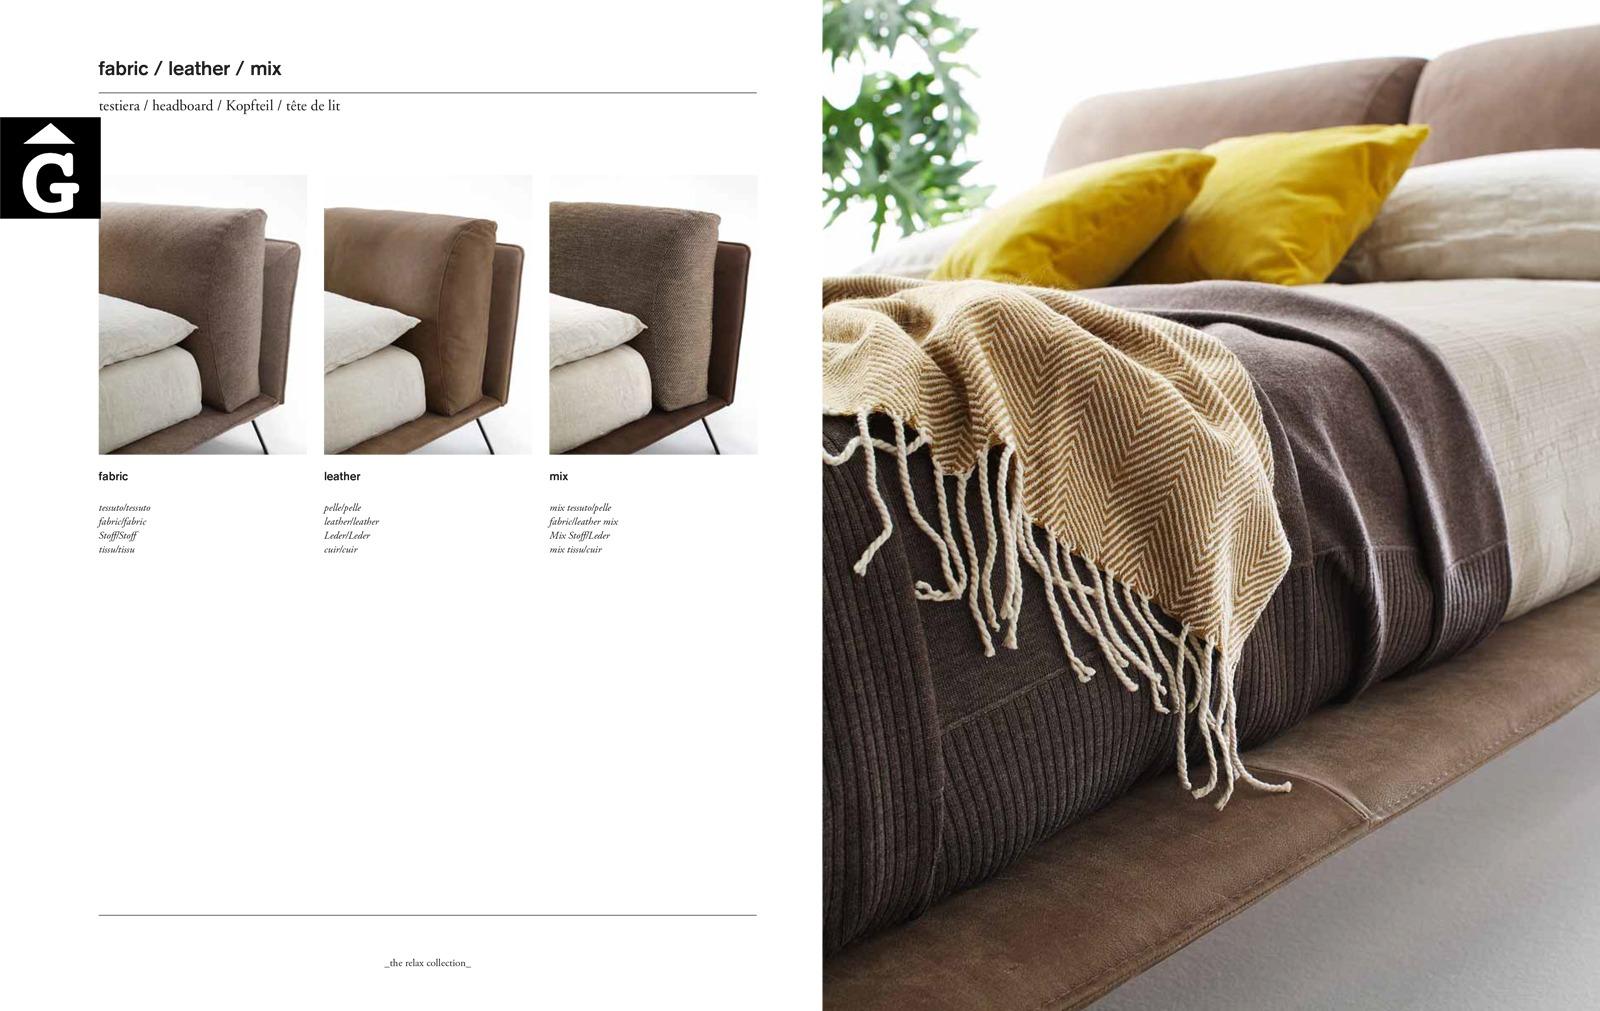 Kanaha detalls acabat llit entapissat - Ditre Italia llits entapissats disseny i qualitat alta by mobles Gifreu